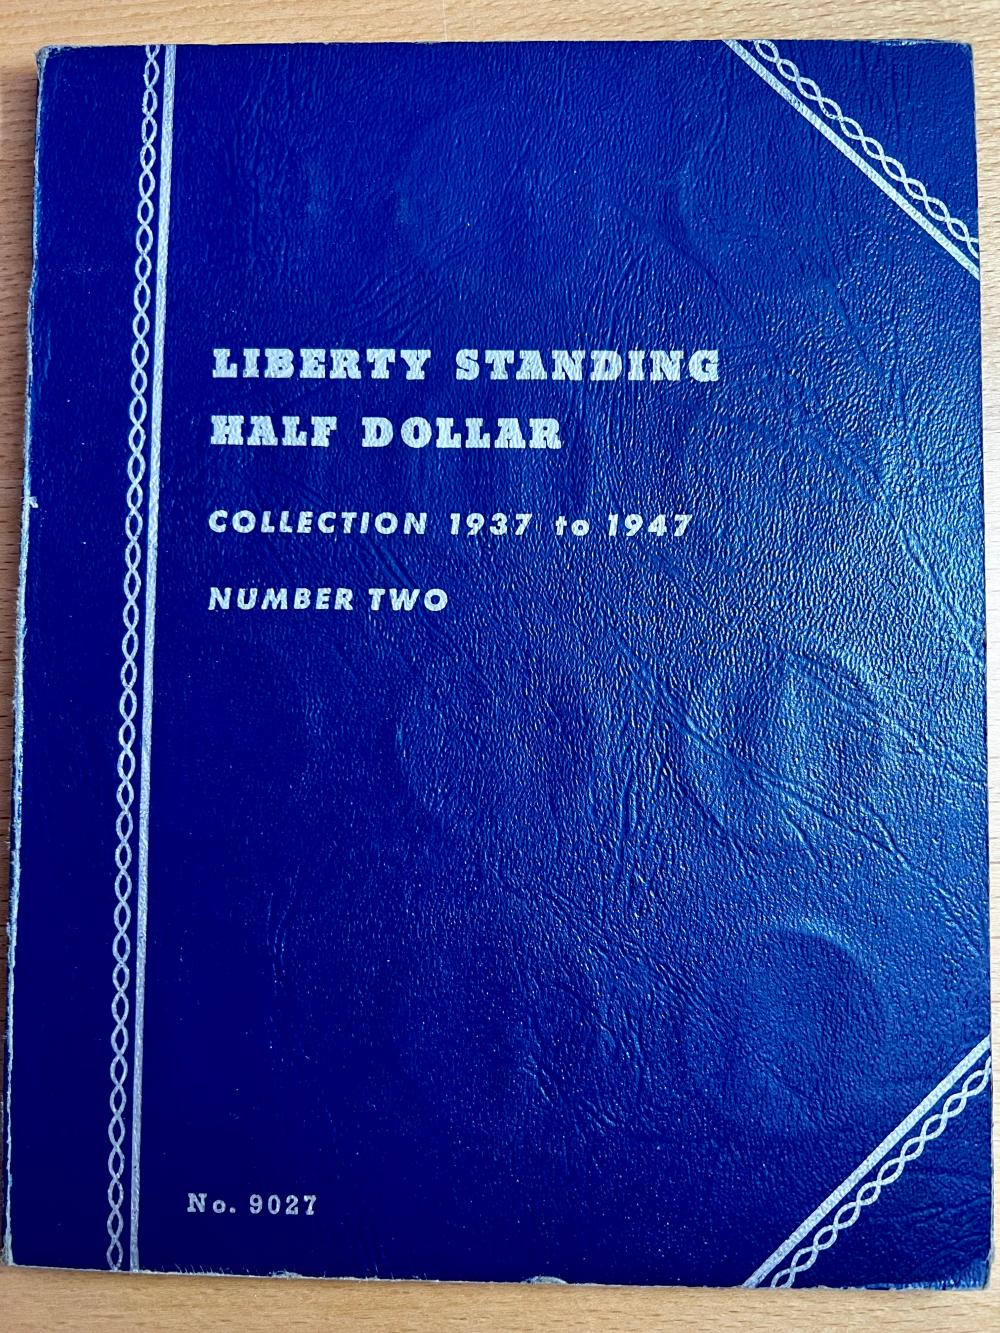 Complete Set Of Walking Liberty Halves 1937-1947